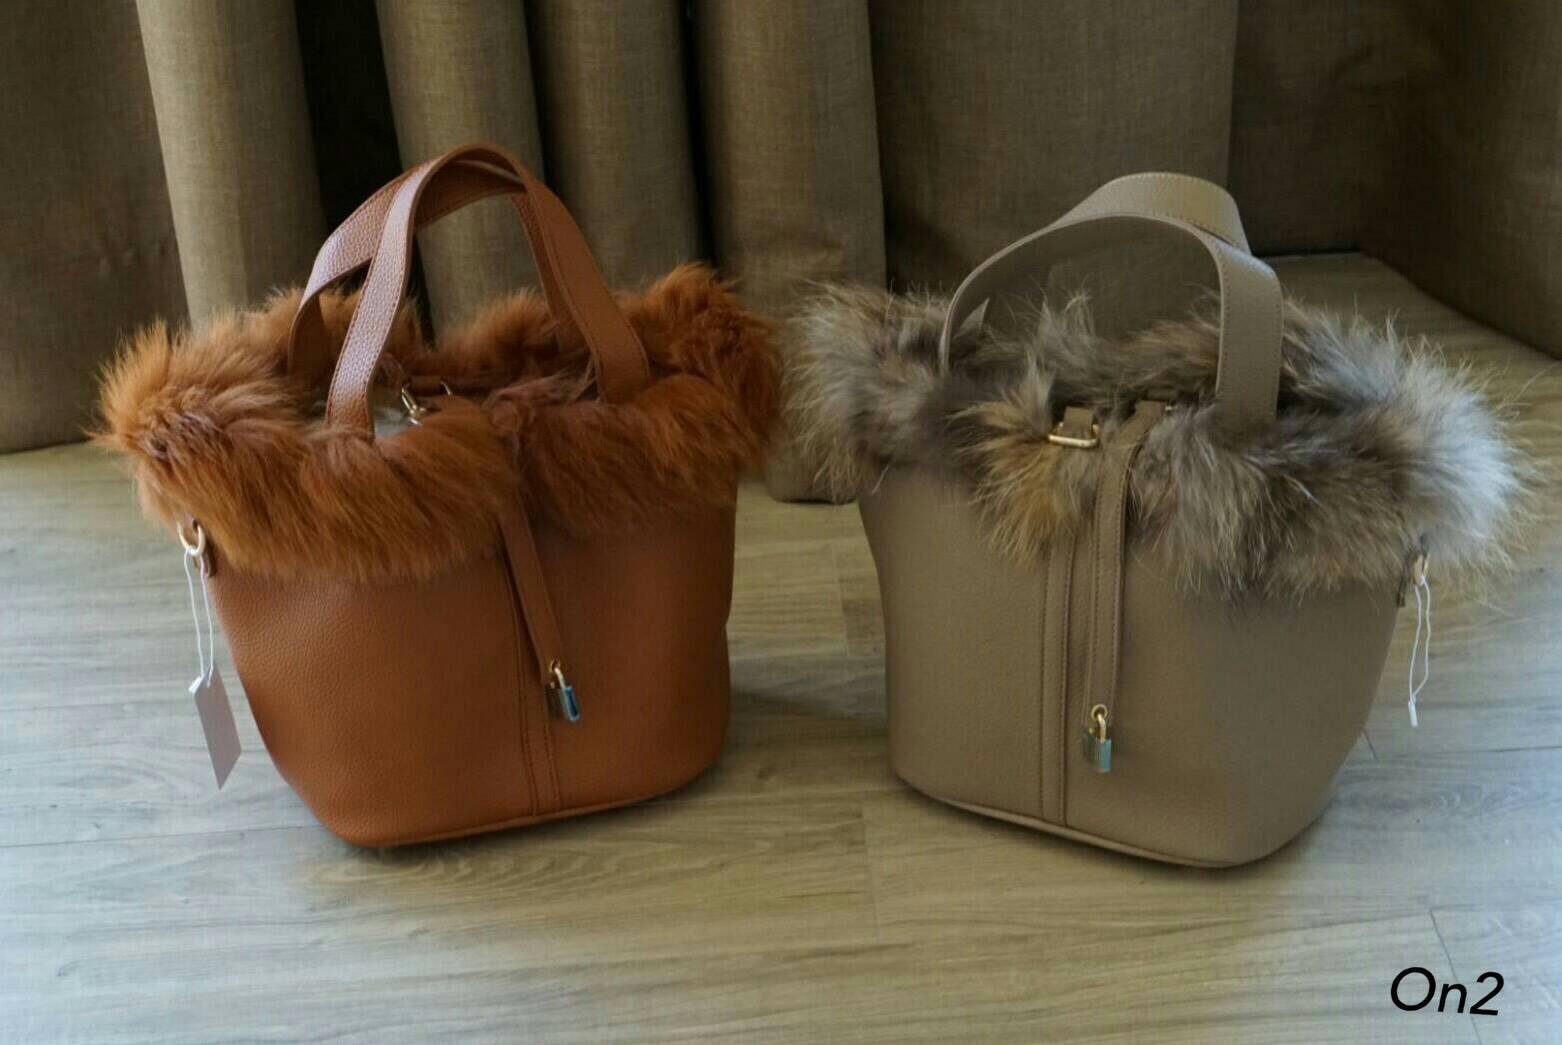 &#x1F49E*Hermes Picotin Fur bag*&#x1F49E